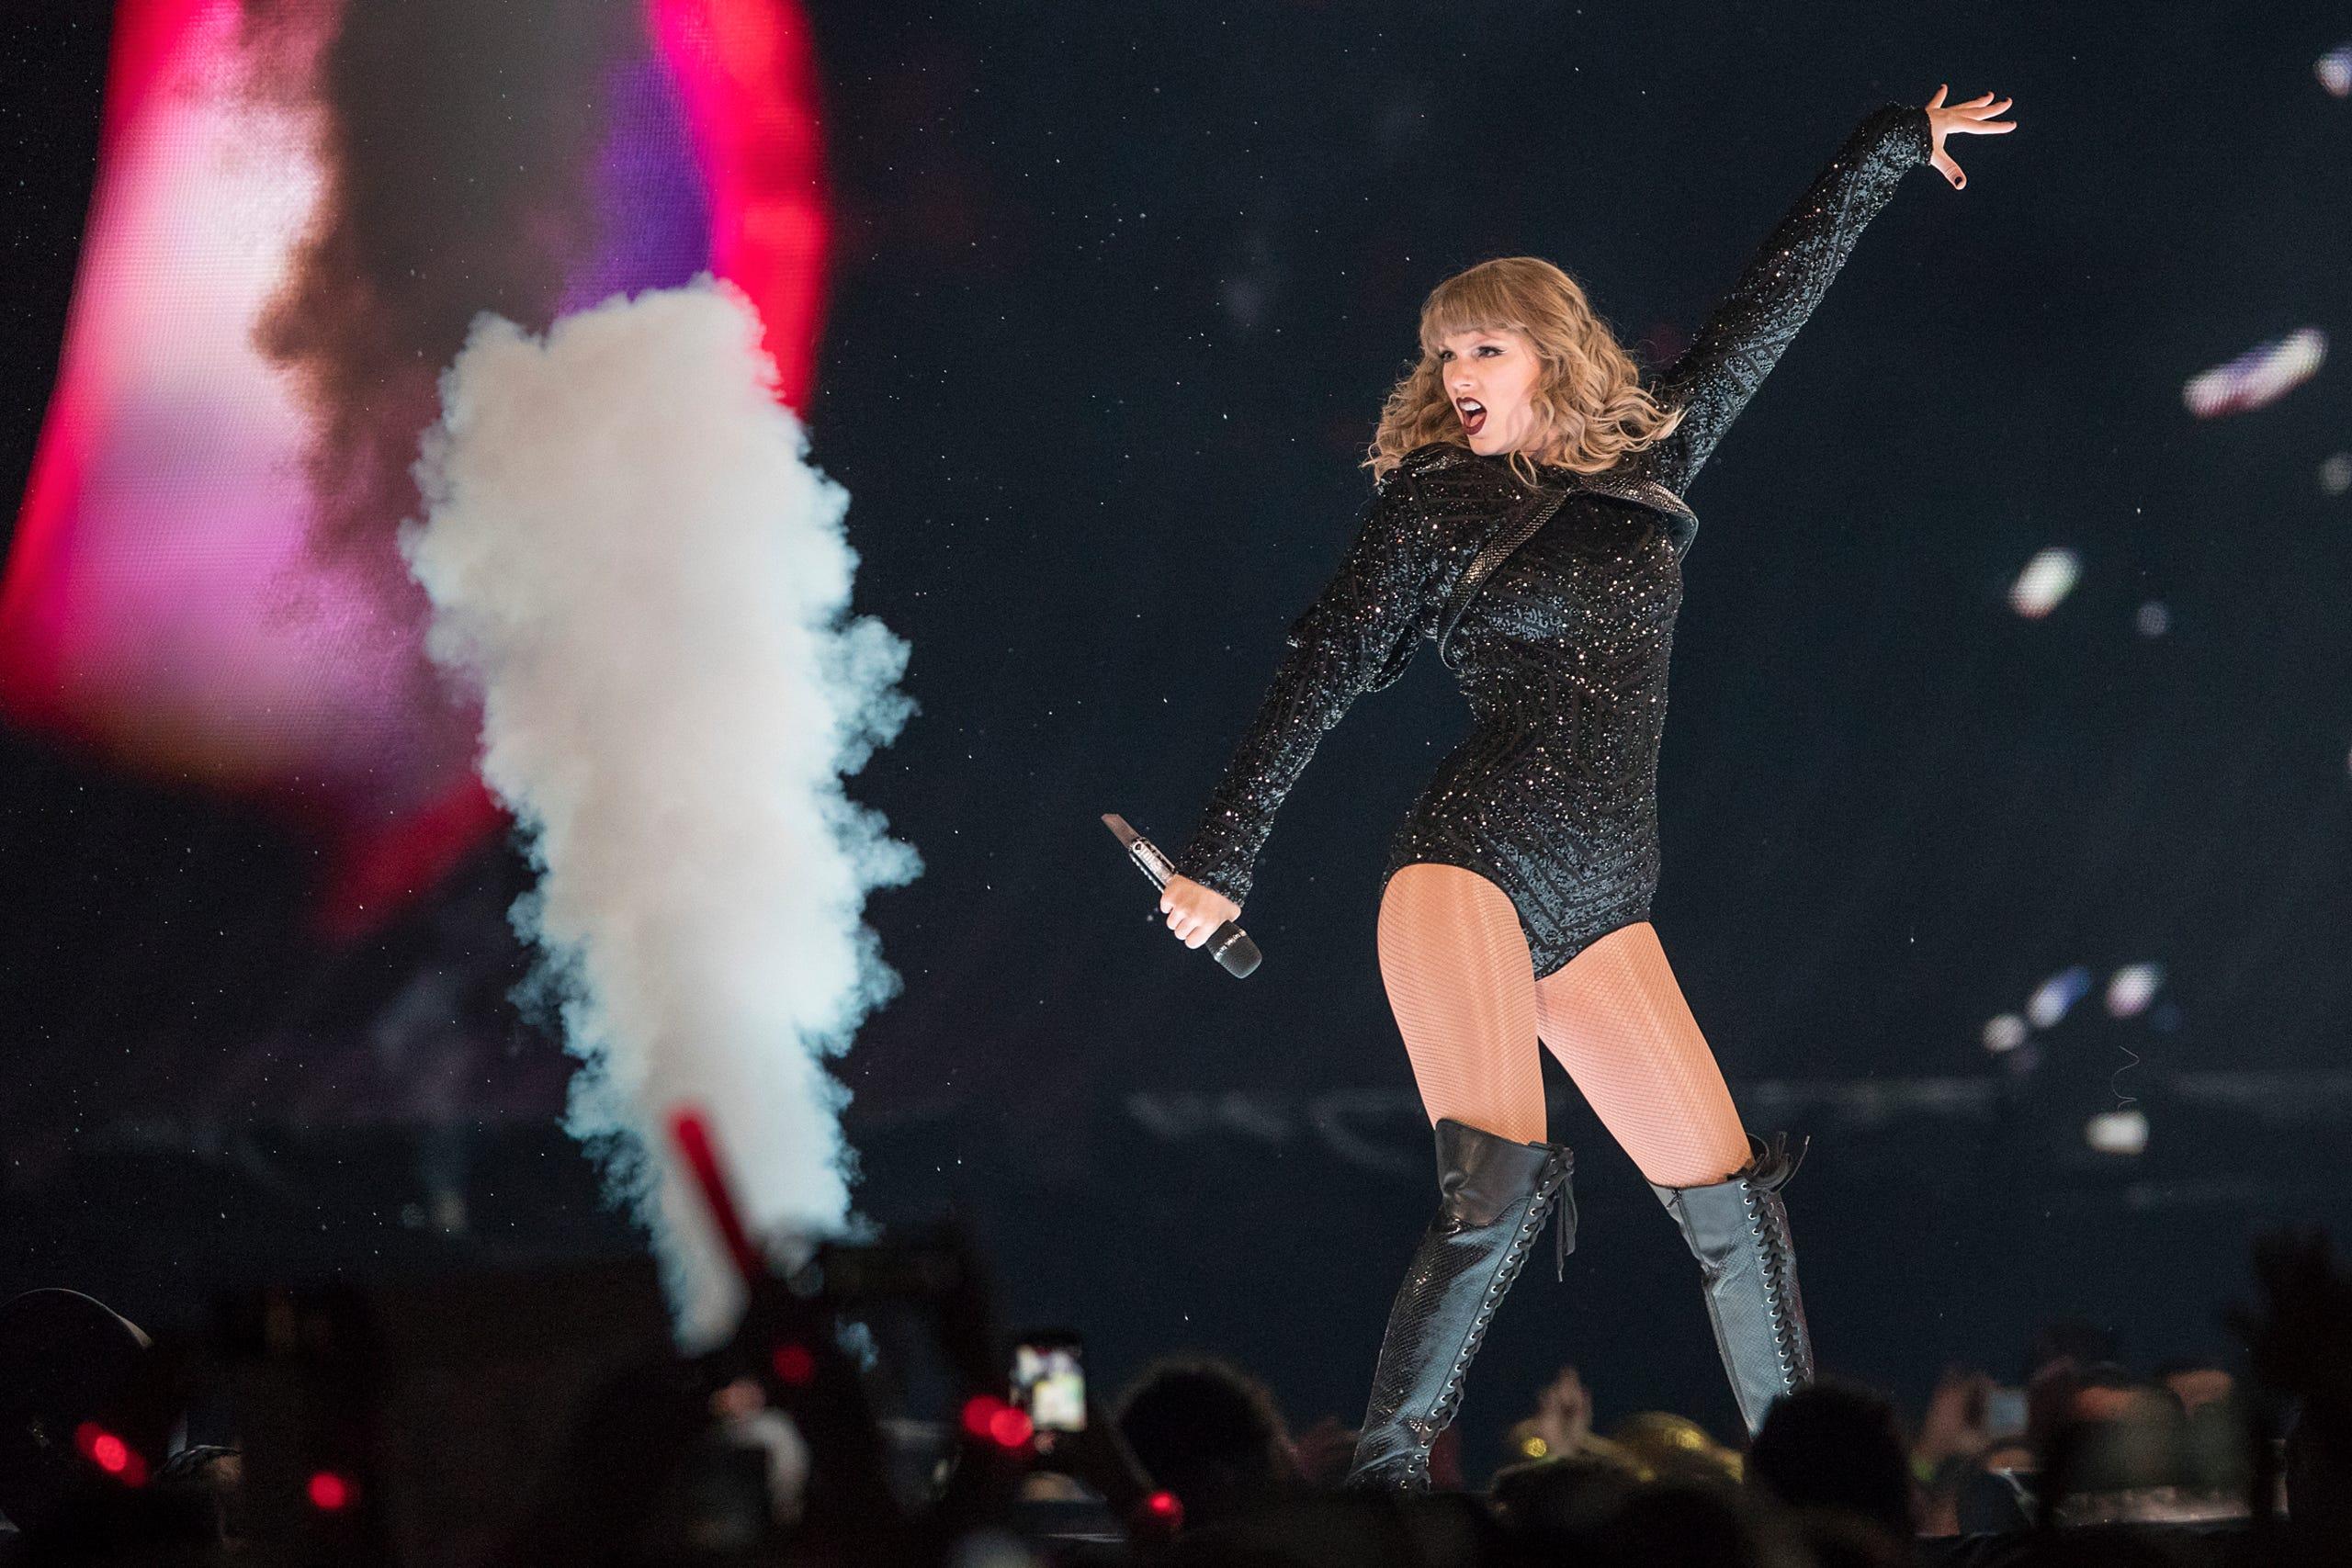 Swifties' flood Lucas Oil Stadium for Taylor Swift's